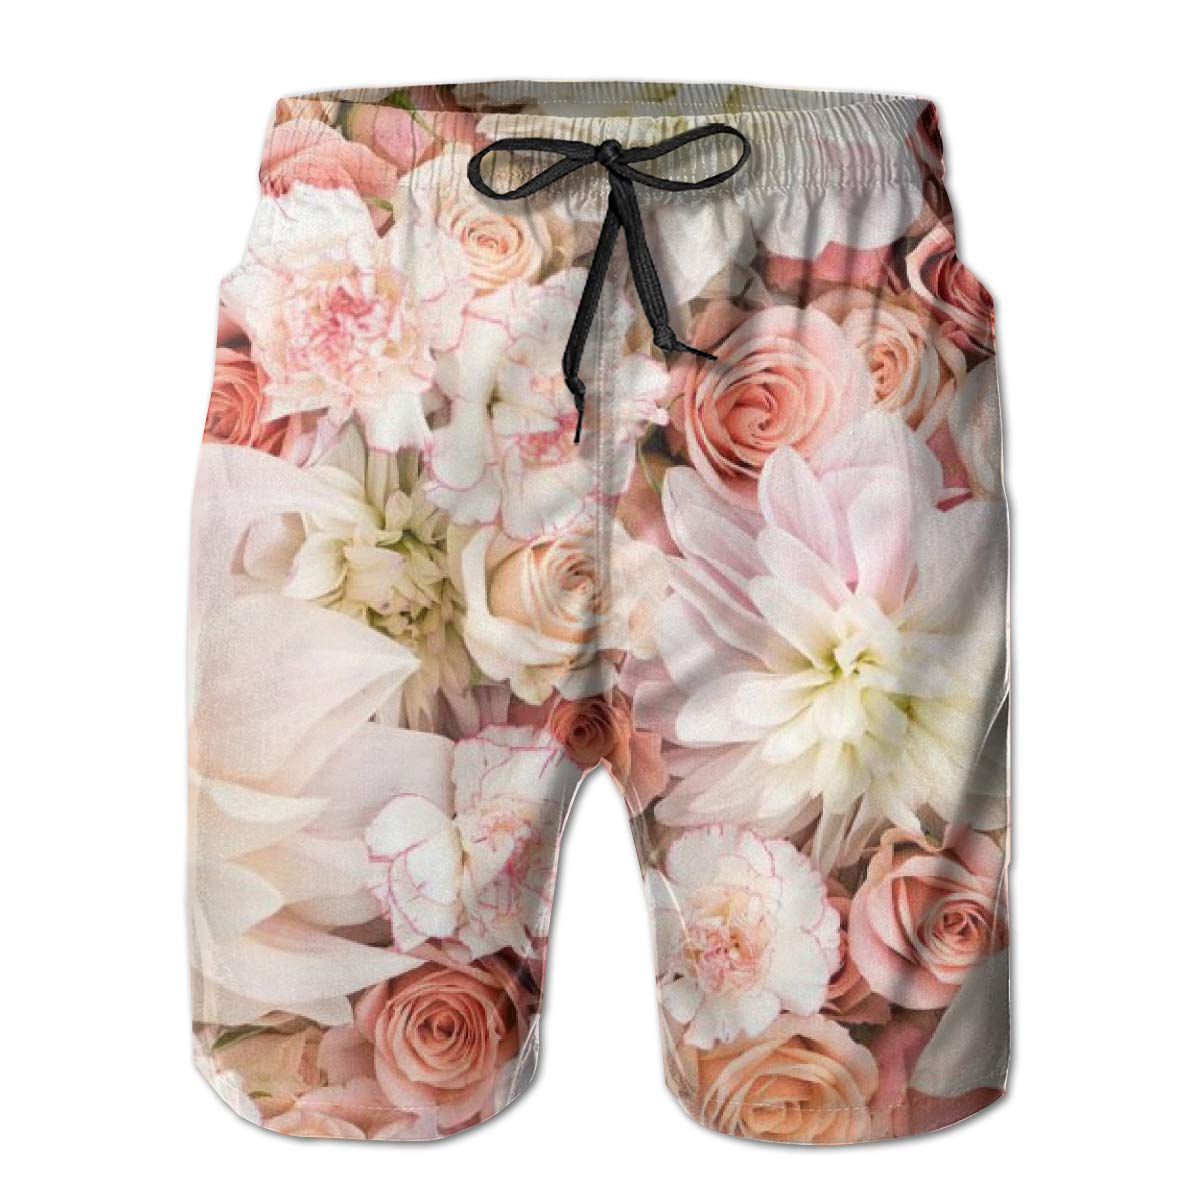 Men Board Shorts Swim Trunks Petal Roses Drawstring Elastic Waist Surfing Beach Summer Outfit Pants